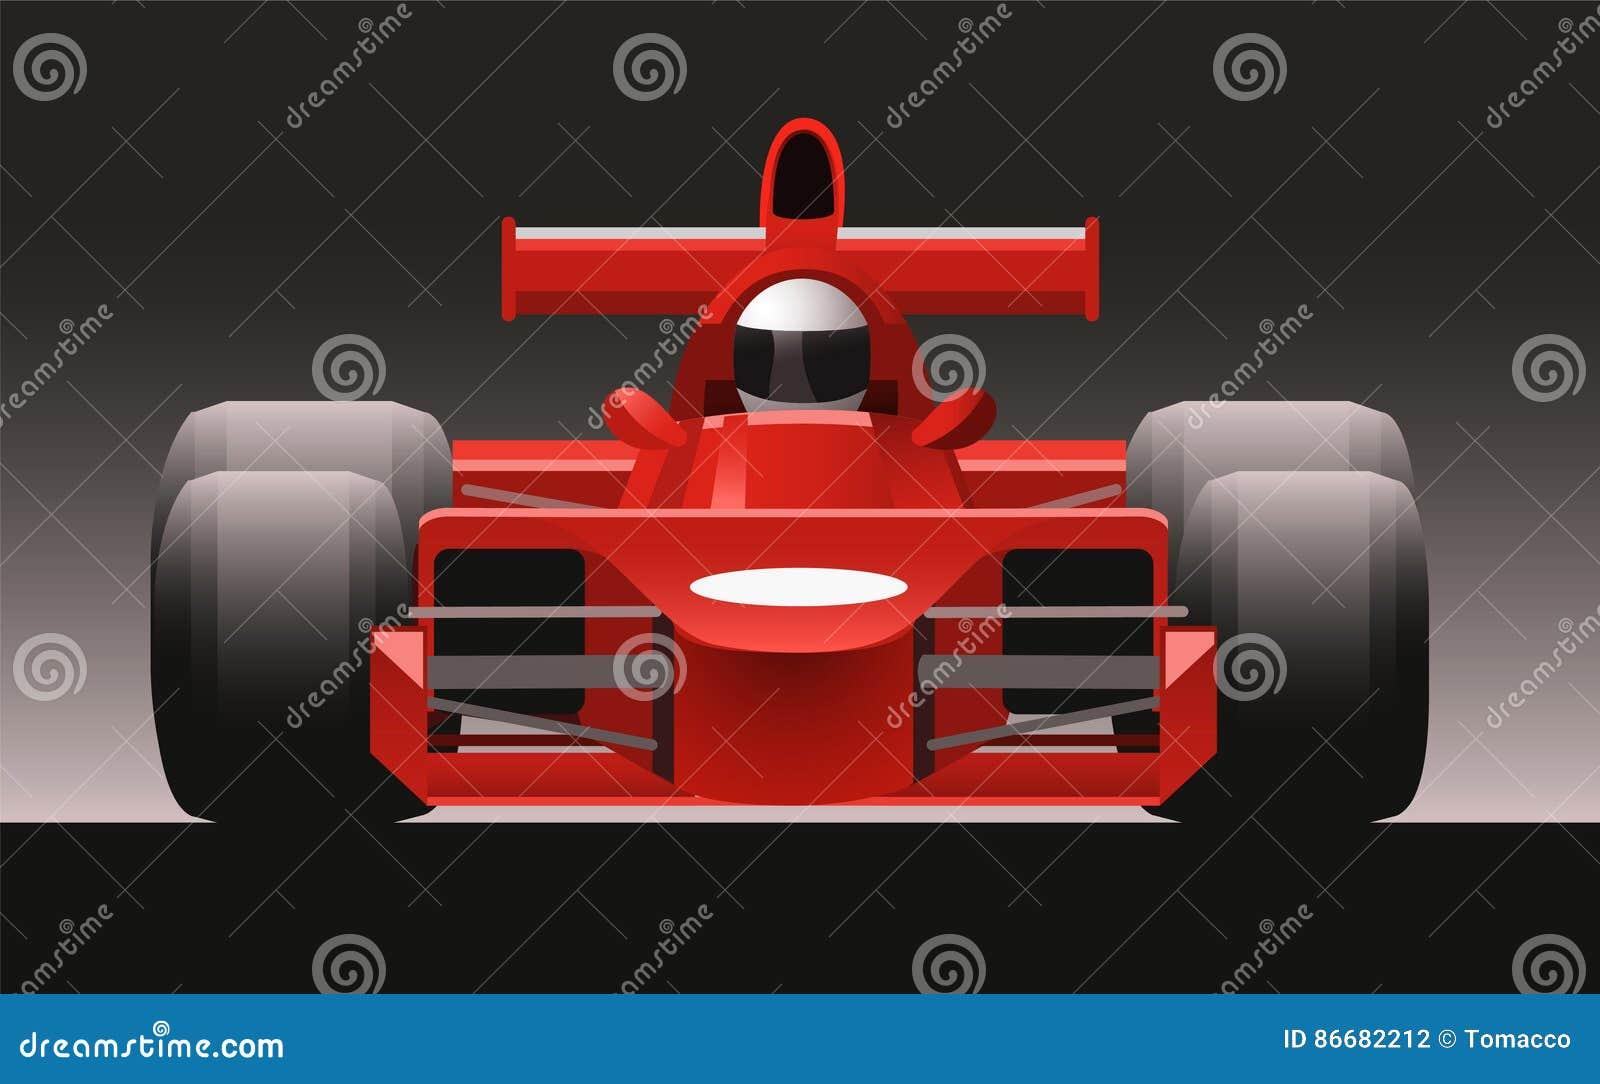 F1 Race Car Front Illustration Stock Illustration Illustration Of Sport Power 86682212